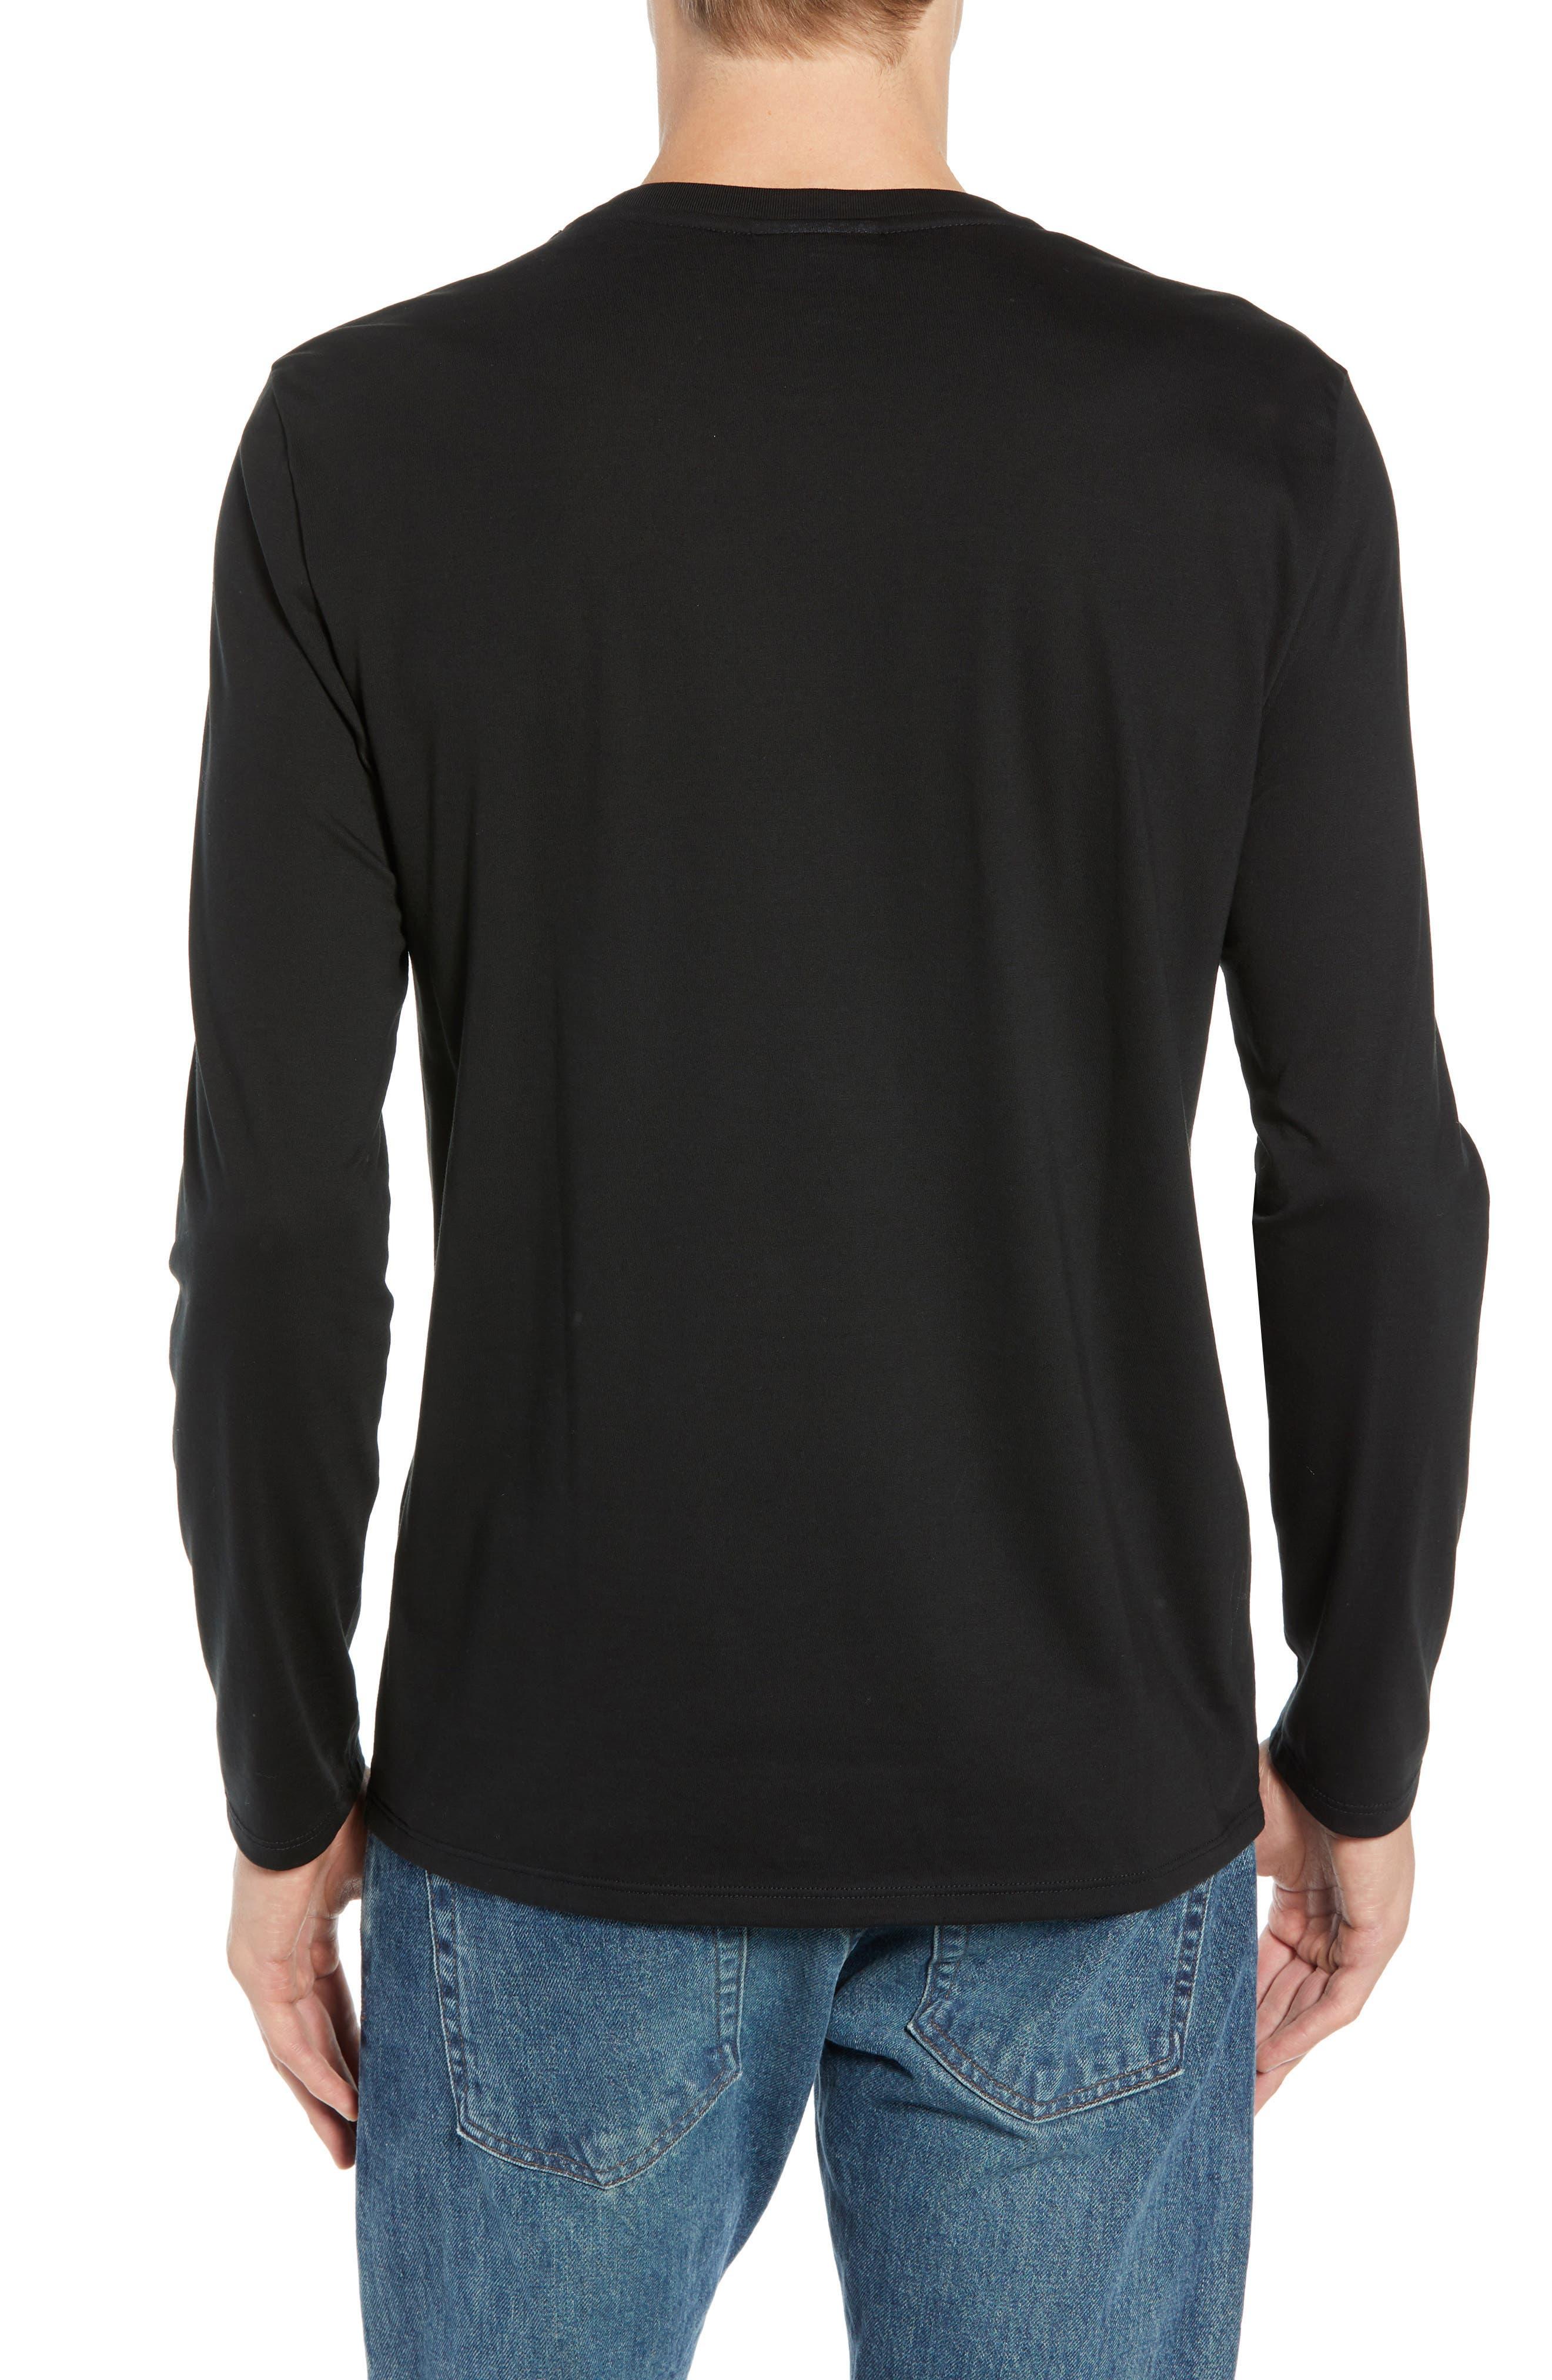 LACOSTE, Long Sleeve Pima Cotton T-Shirt, Alternate thumbnail 2, color, BLACK